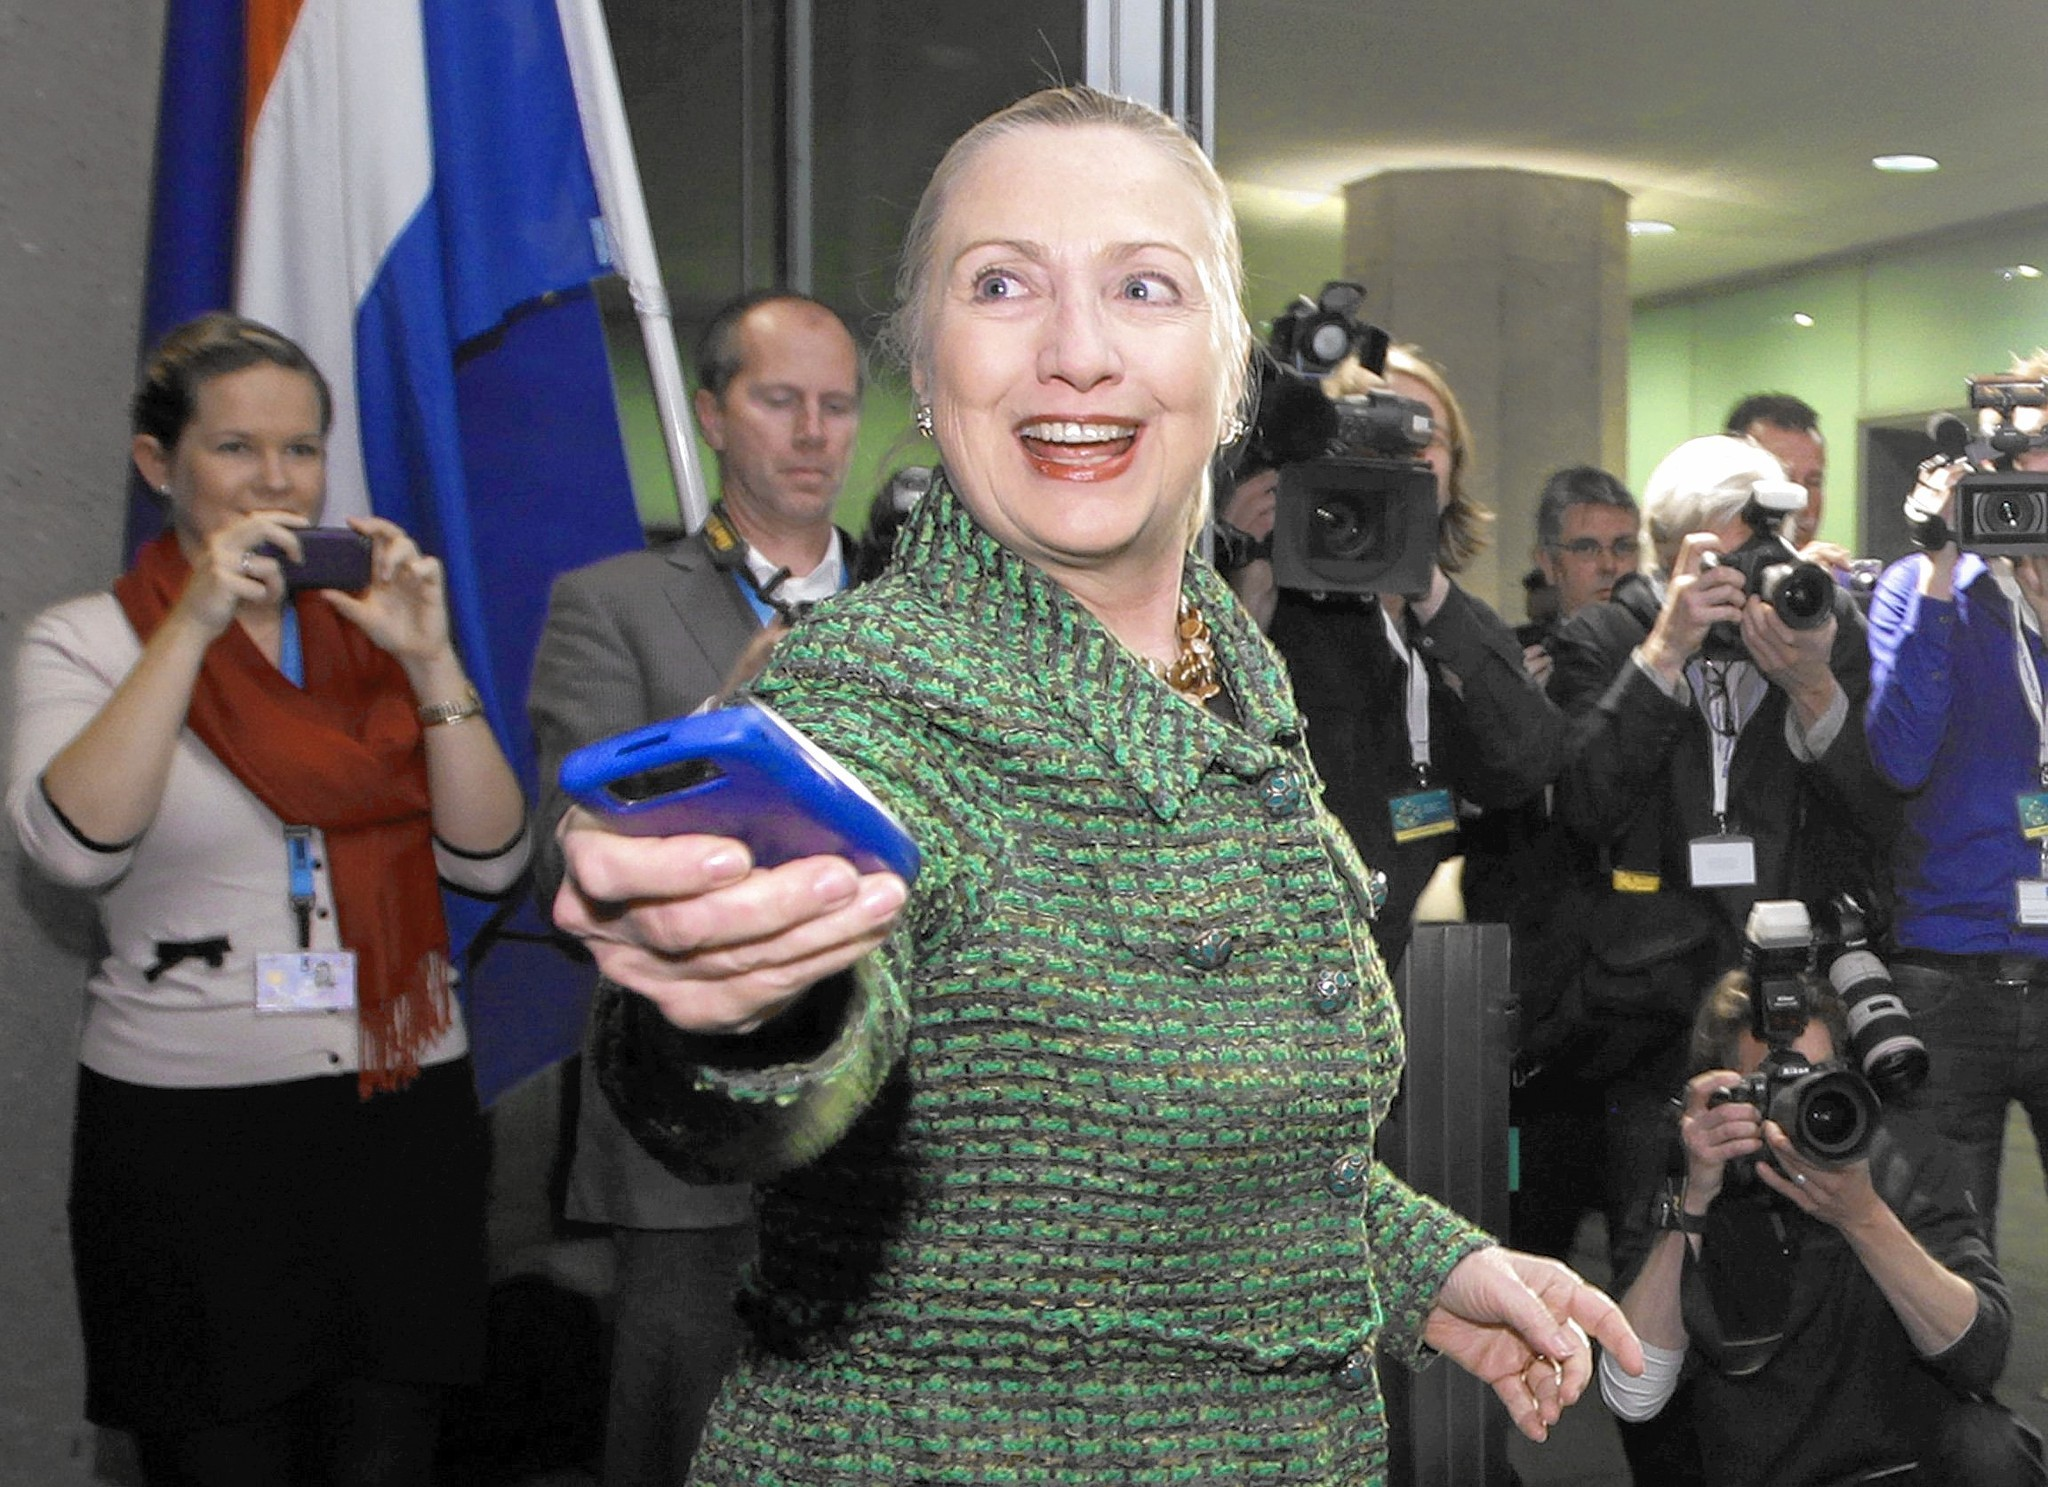 Can Hillary Clinton Go To A Swiss Sleep Sanitarium Can